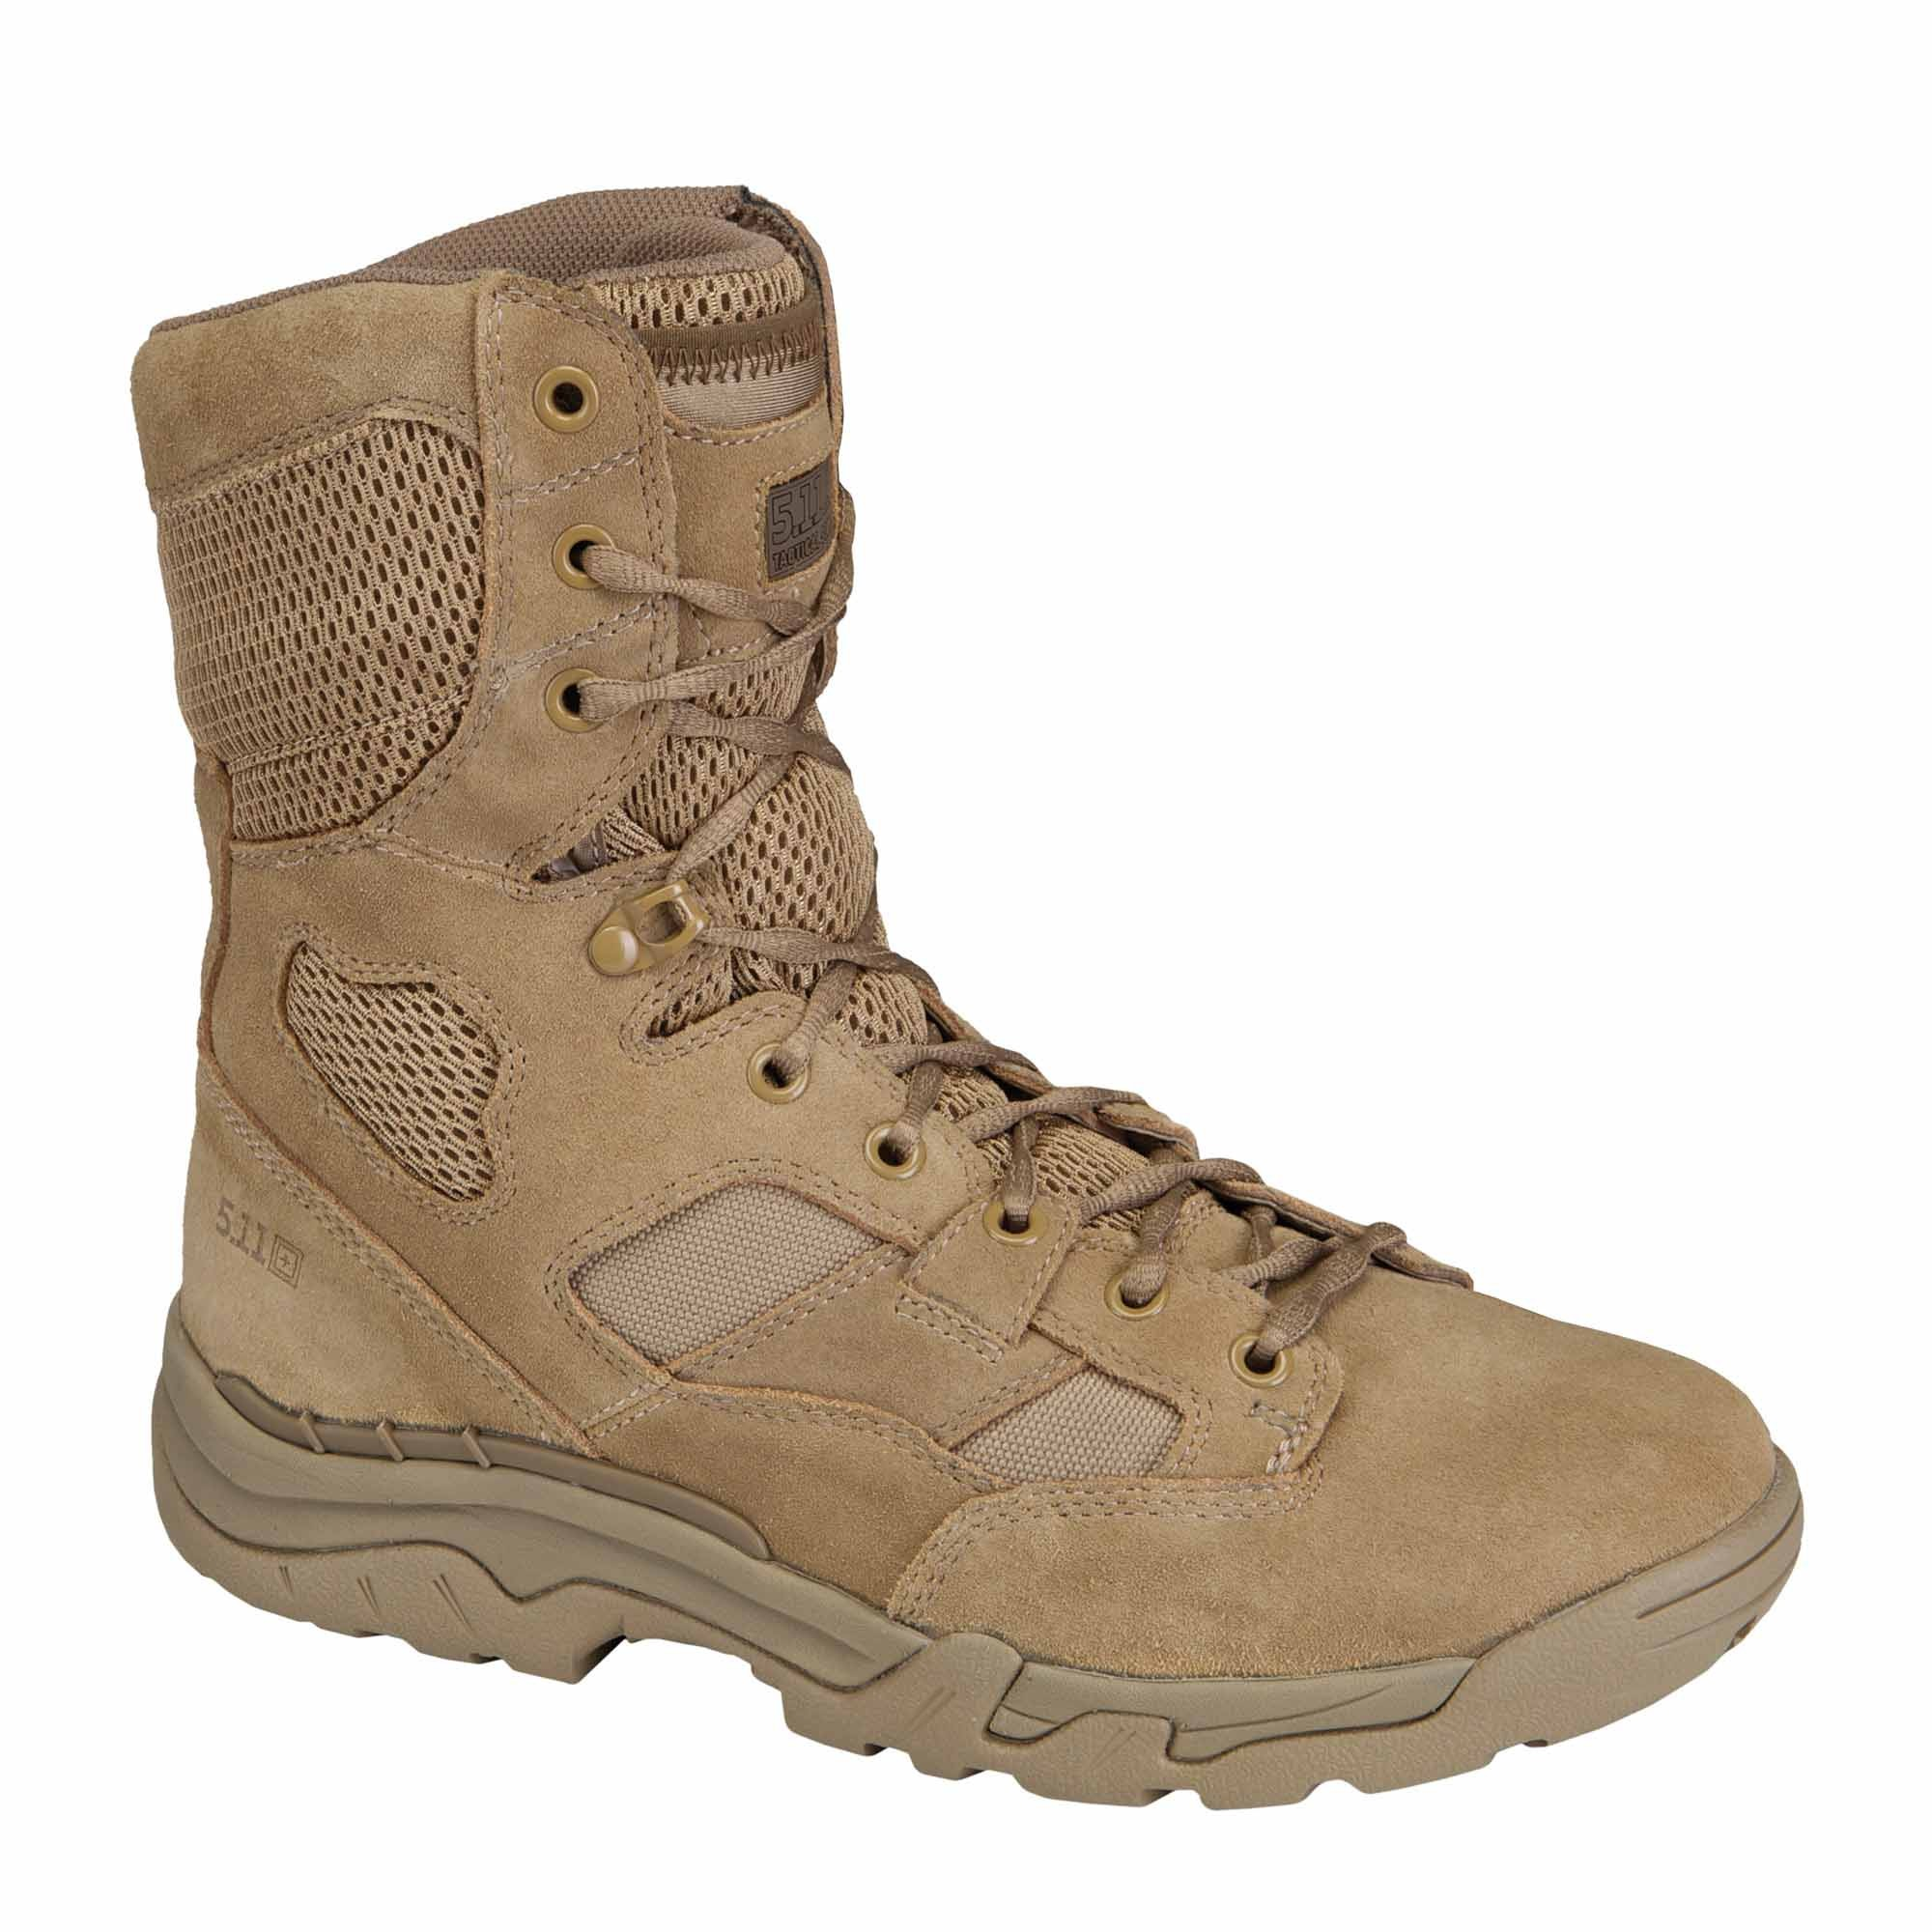 5.11 8″ TACLITE Boot